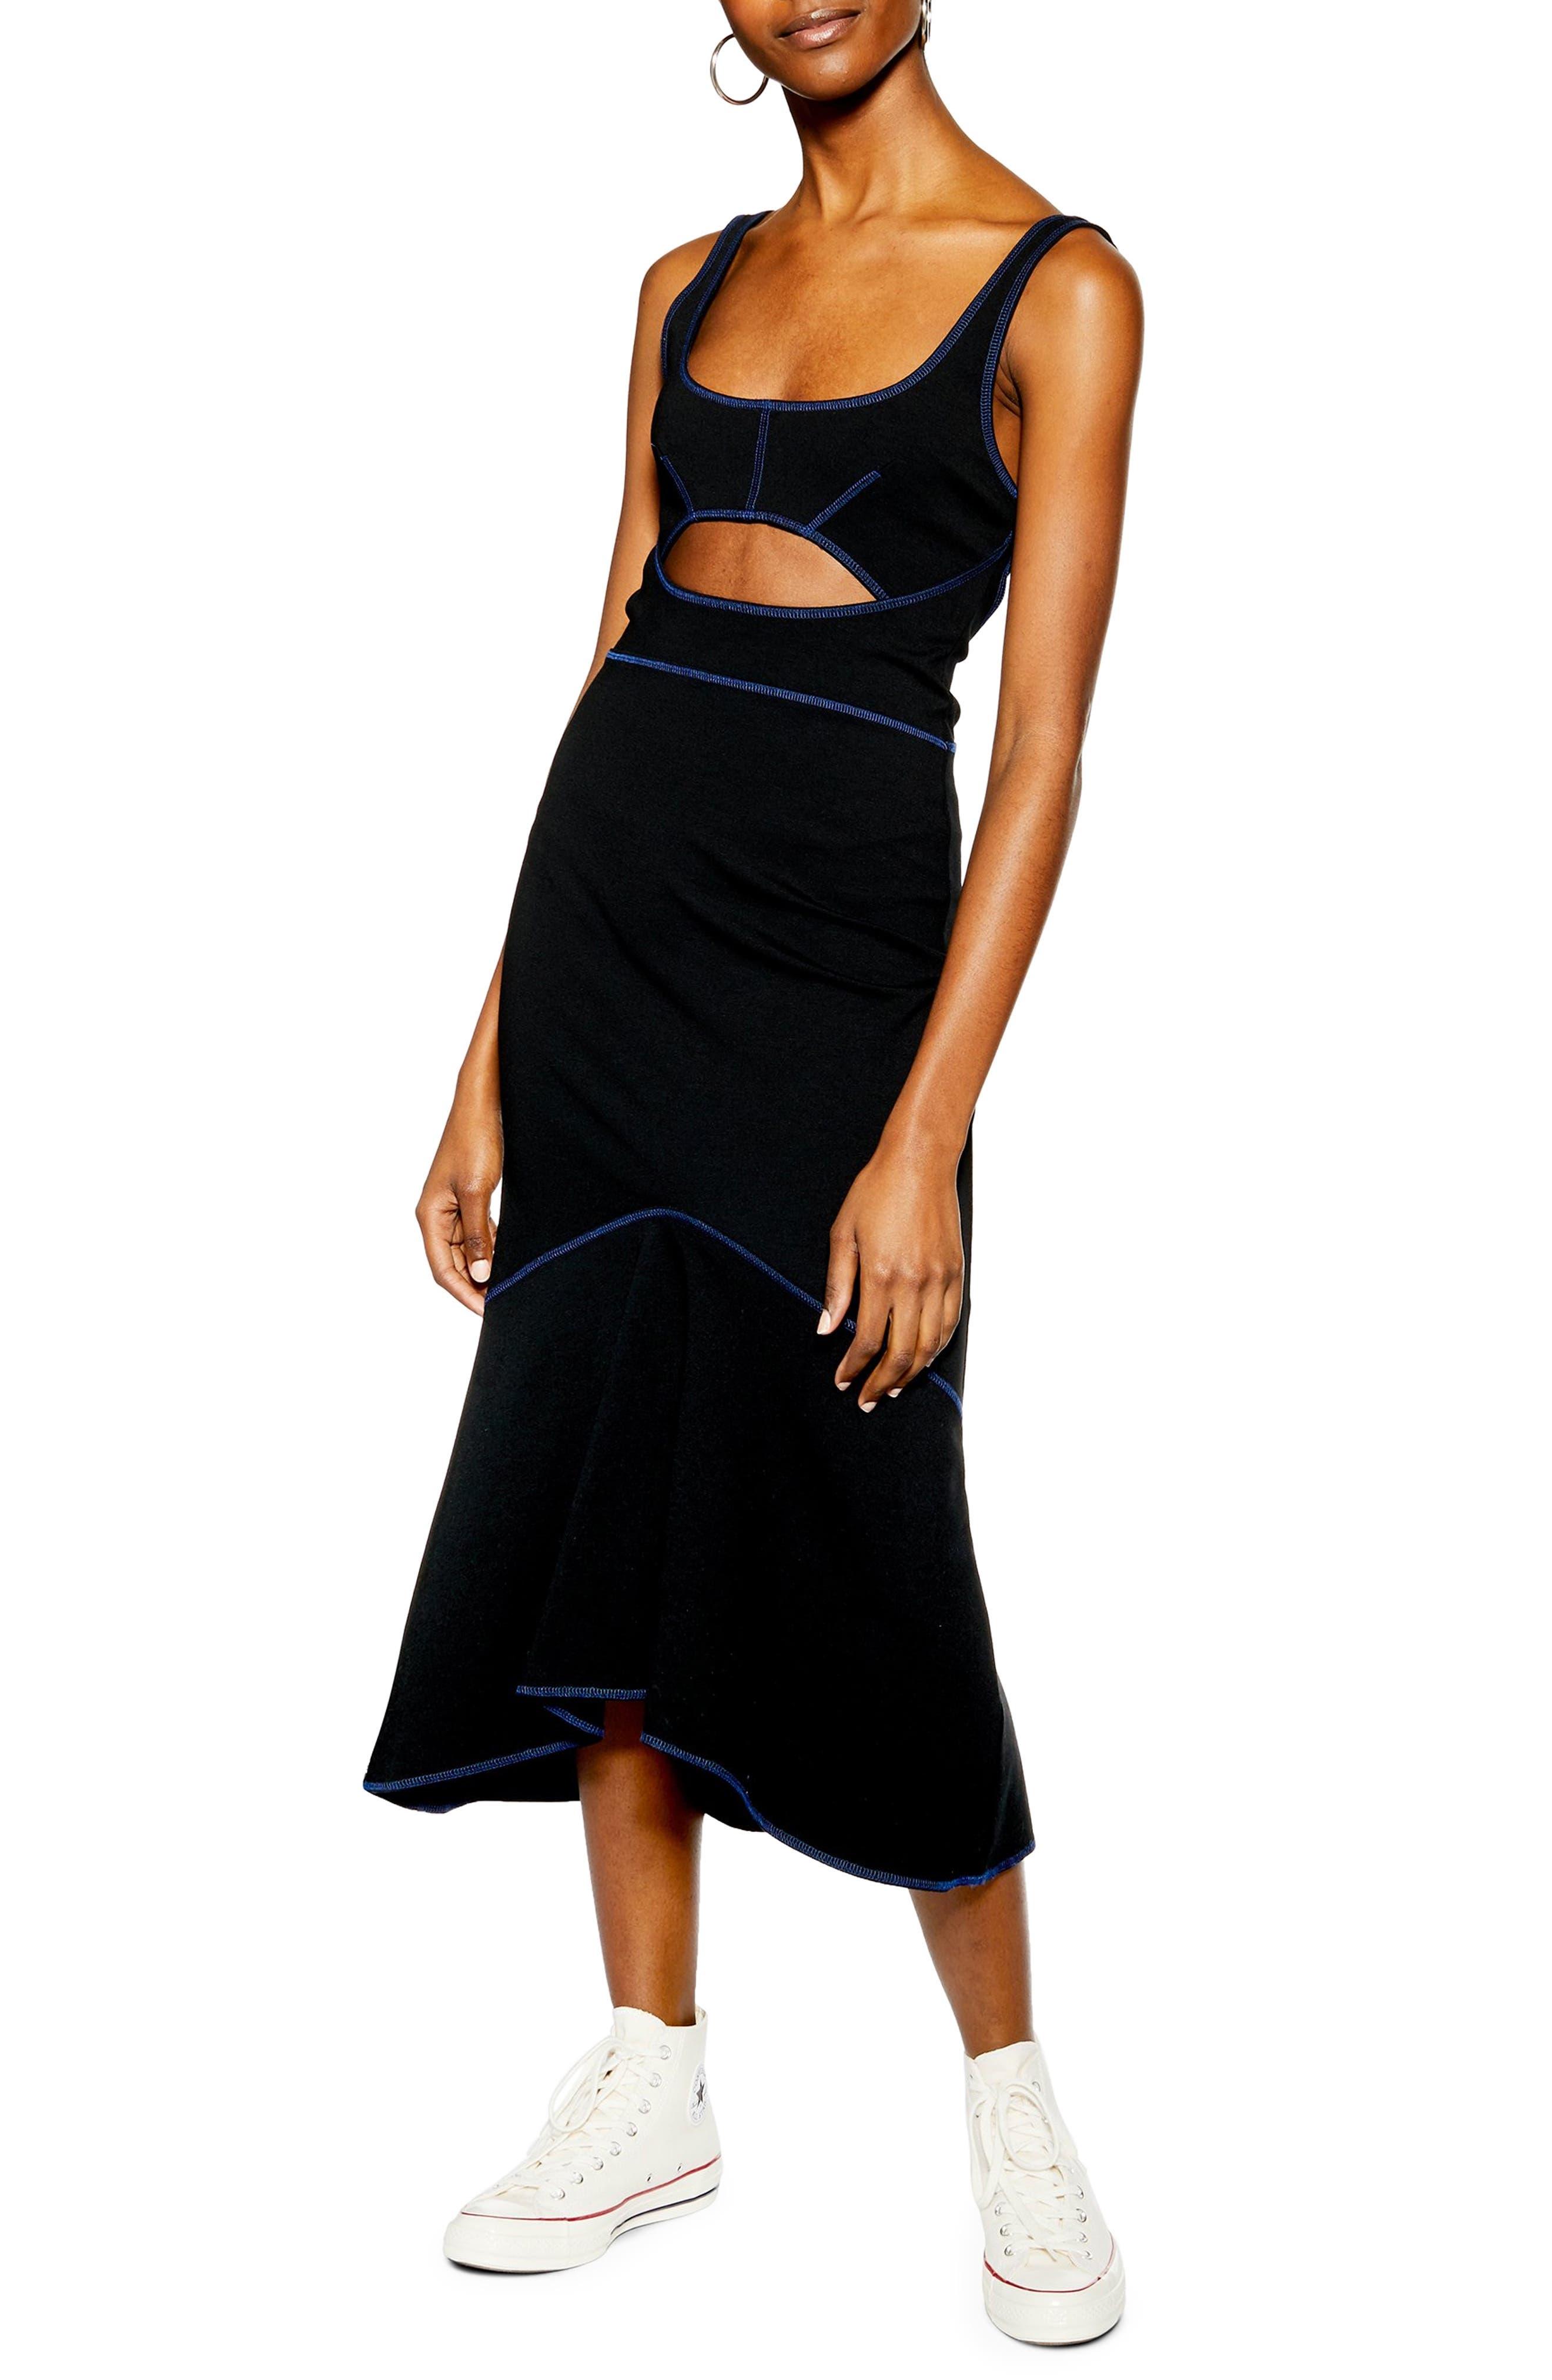 Topshop Racer Body-Con Midi Dress, US (fits like 0) - Black